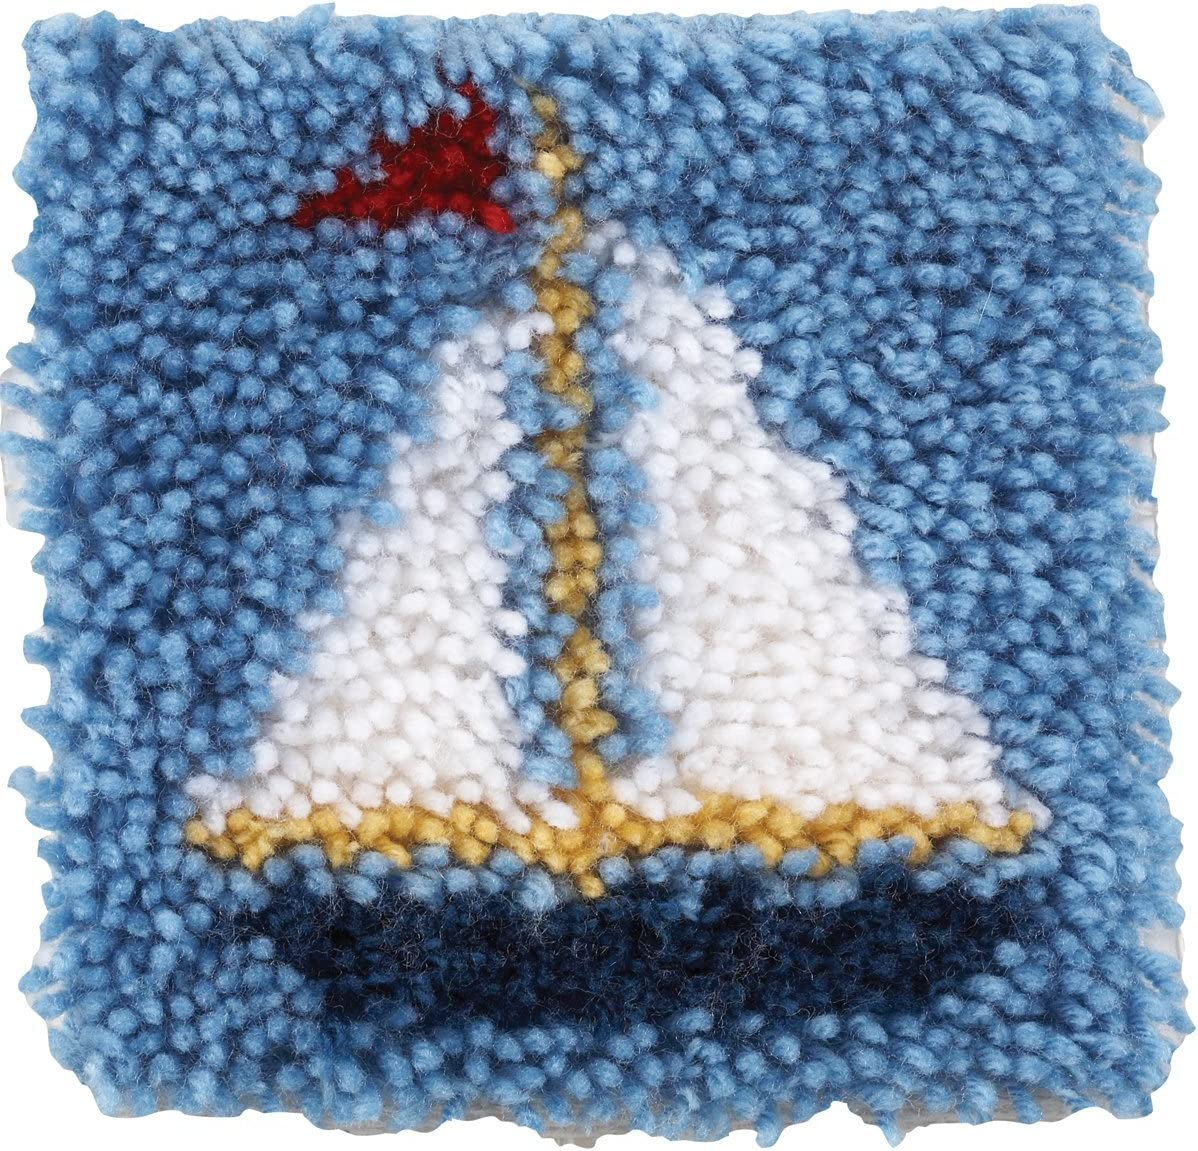 Sailboat Spinrite Wonderart Latch Hook Kit 8 by 8-Inch